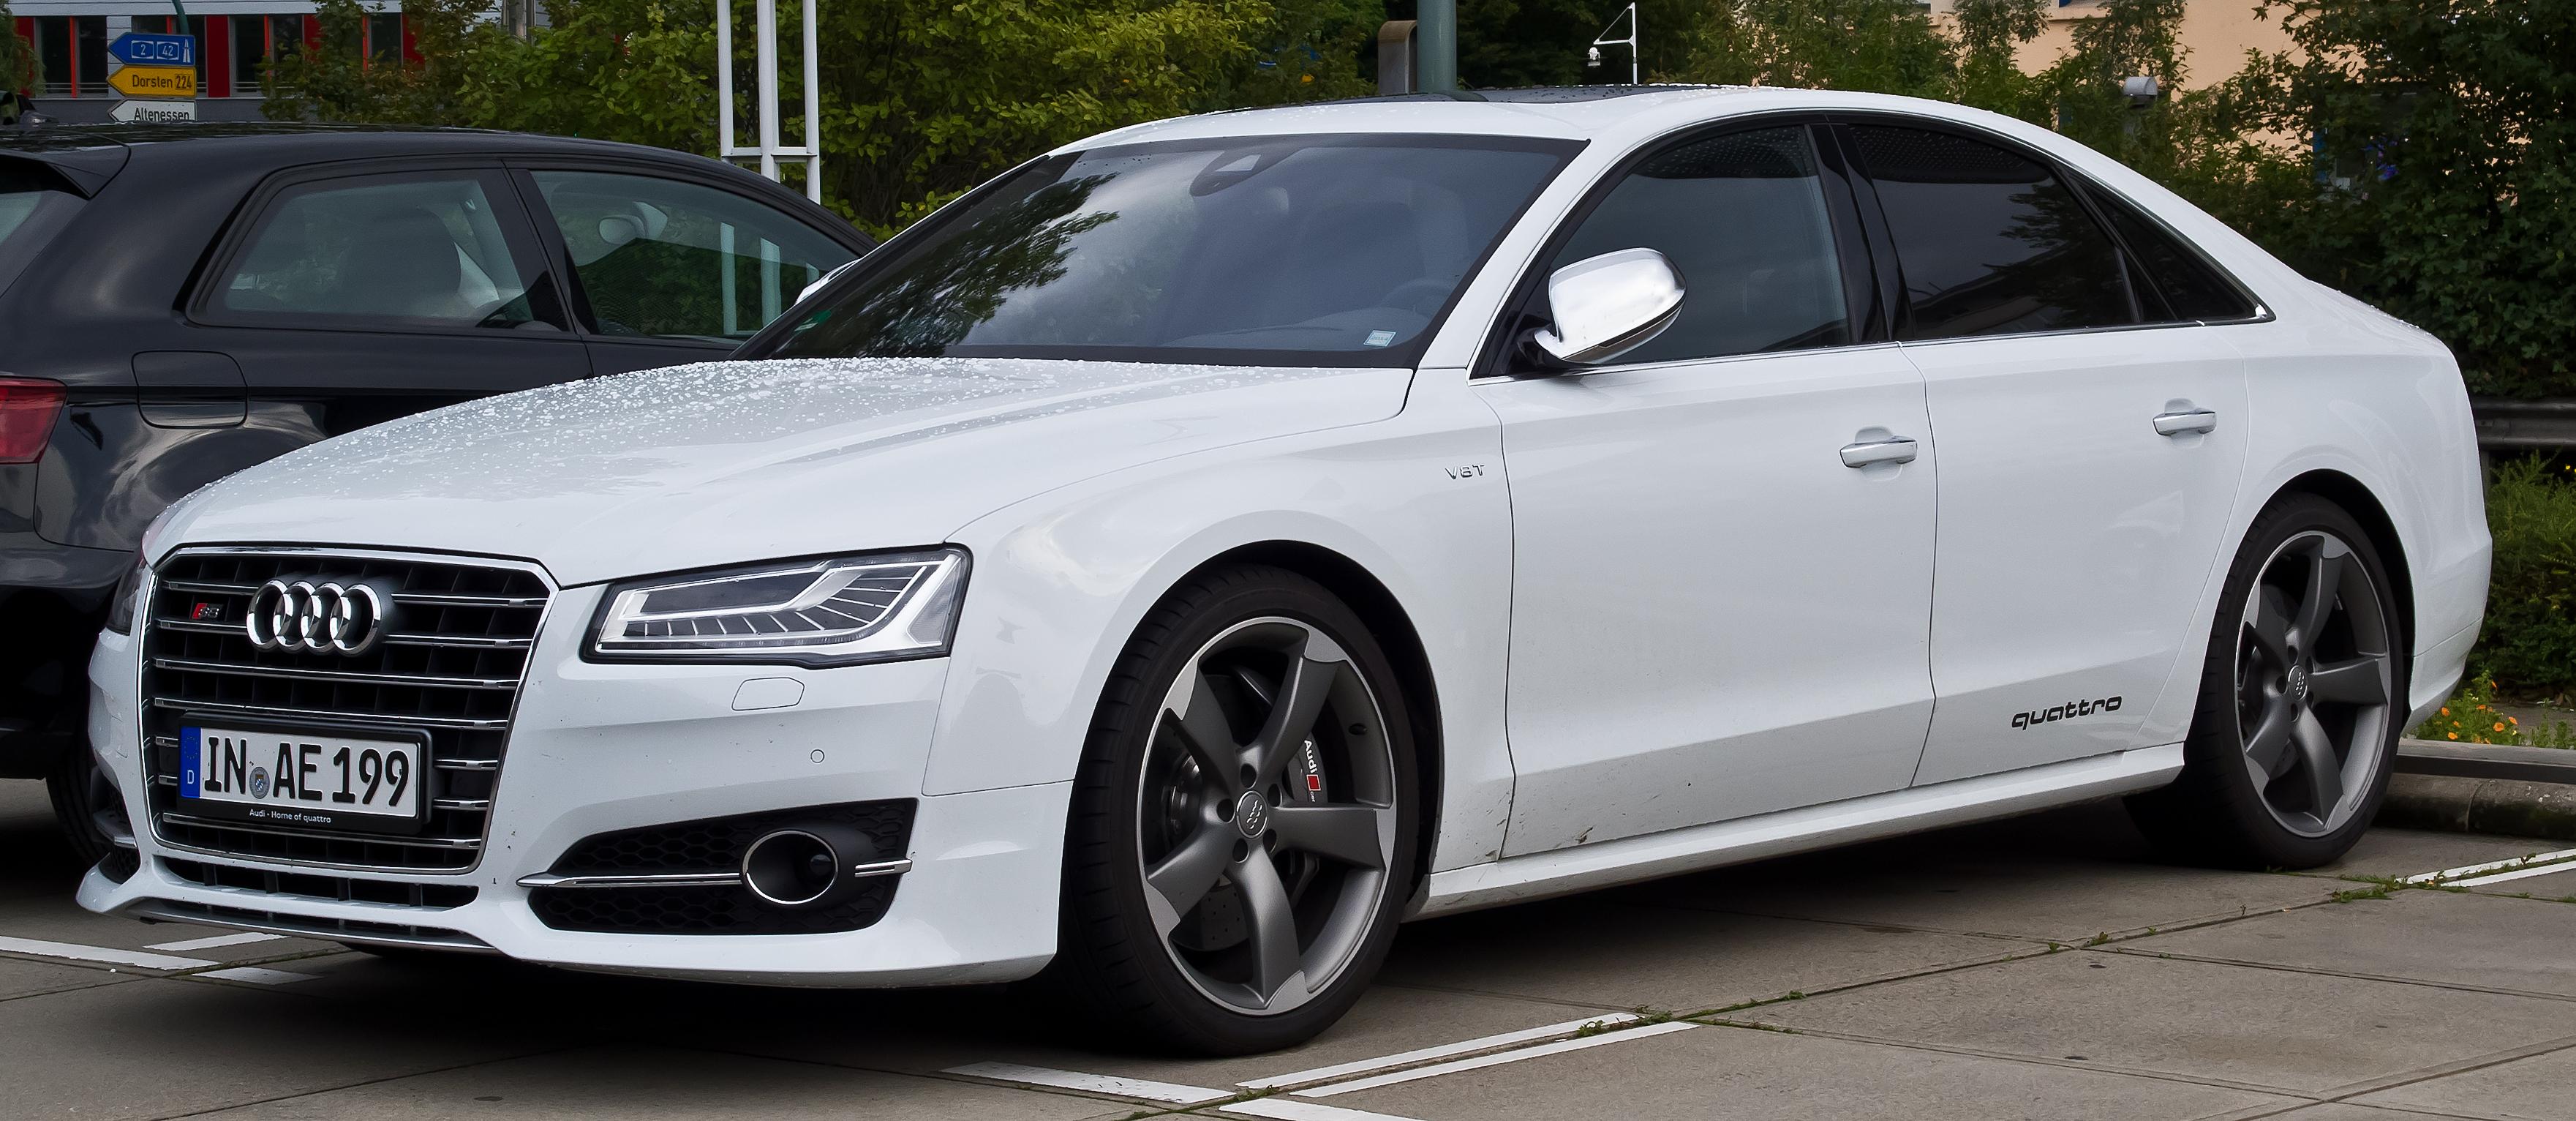 File Audi S8 D4 Facelift Frontansicht 16 August